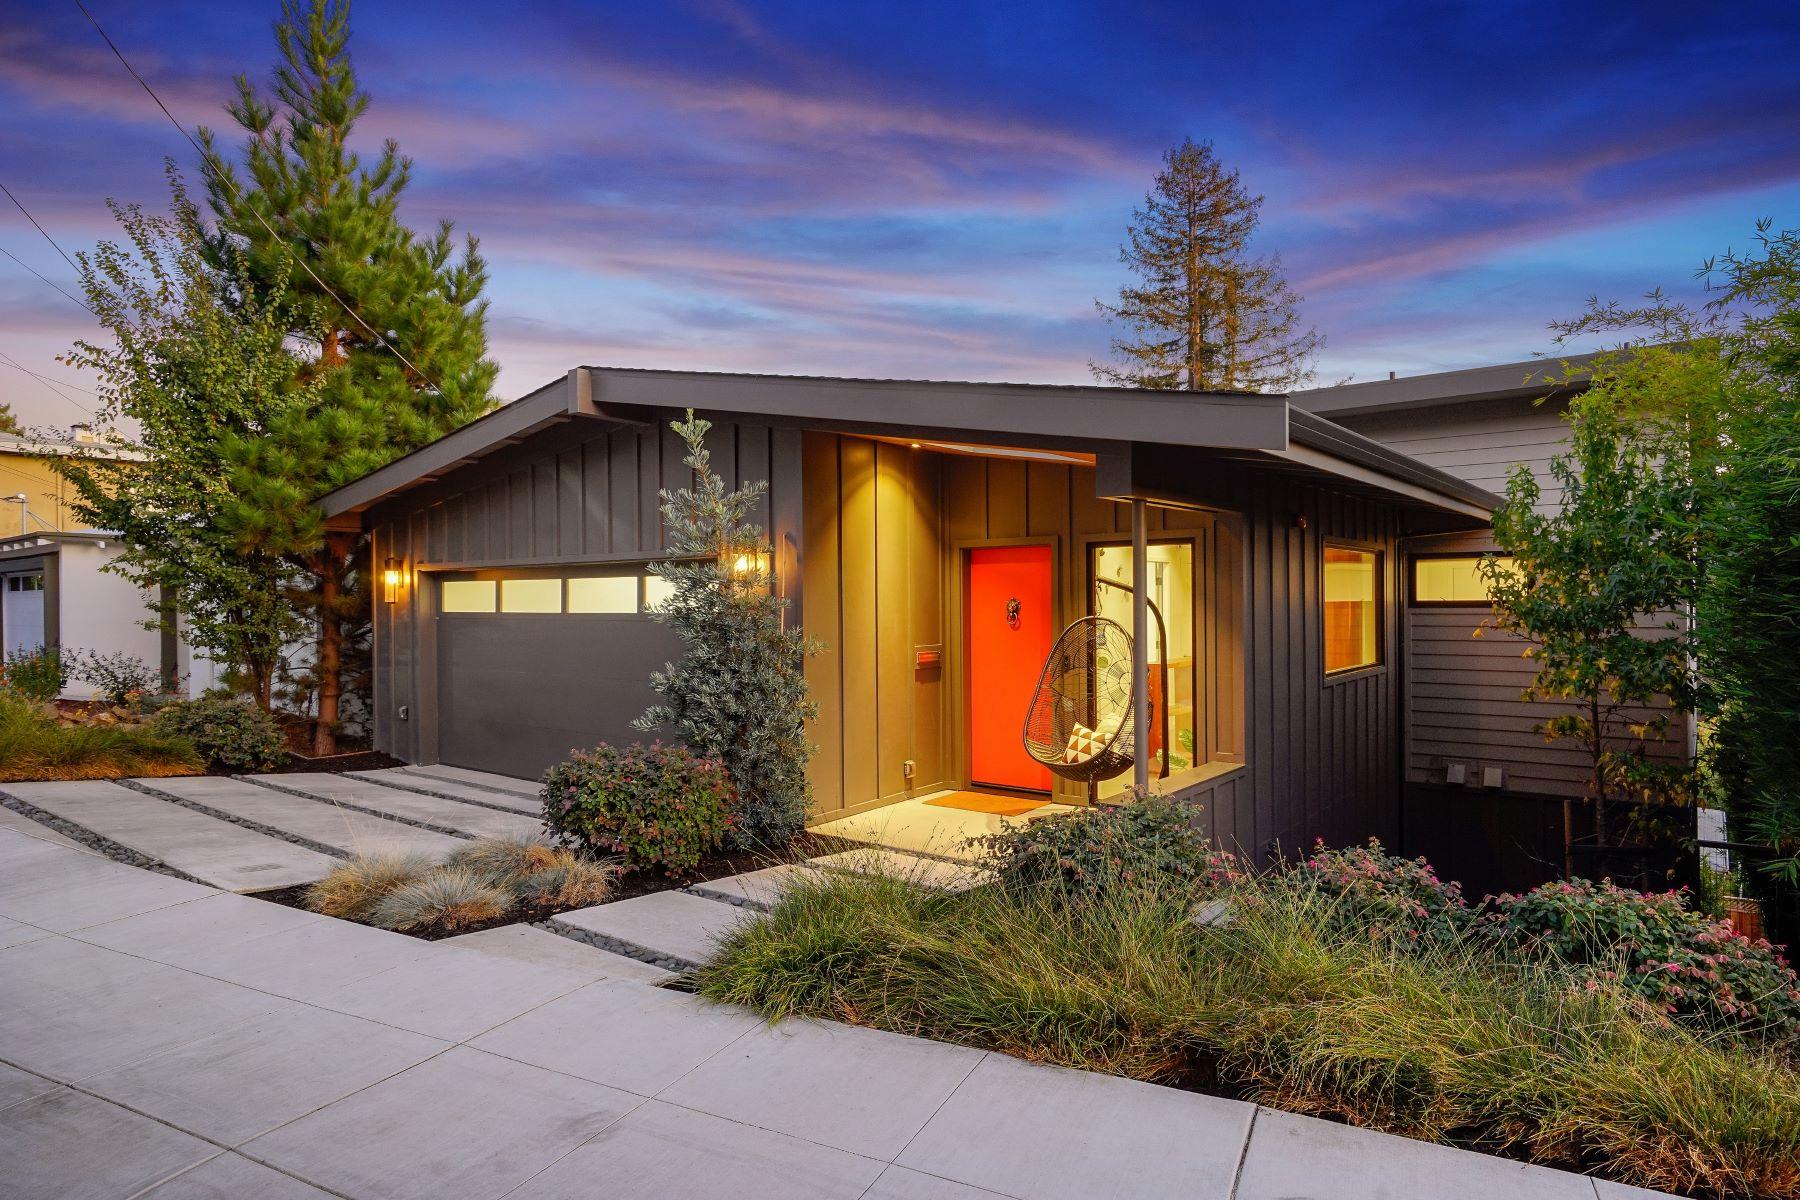 Single Family Homes for Sale at Stunning Crocker Highlands Modern 693 Santa Ray Avenue Oakland, California 94610 United States